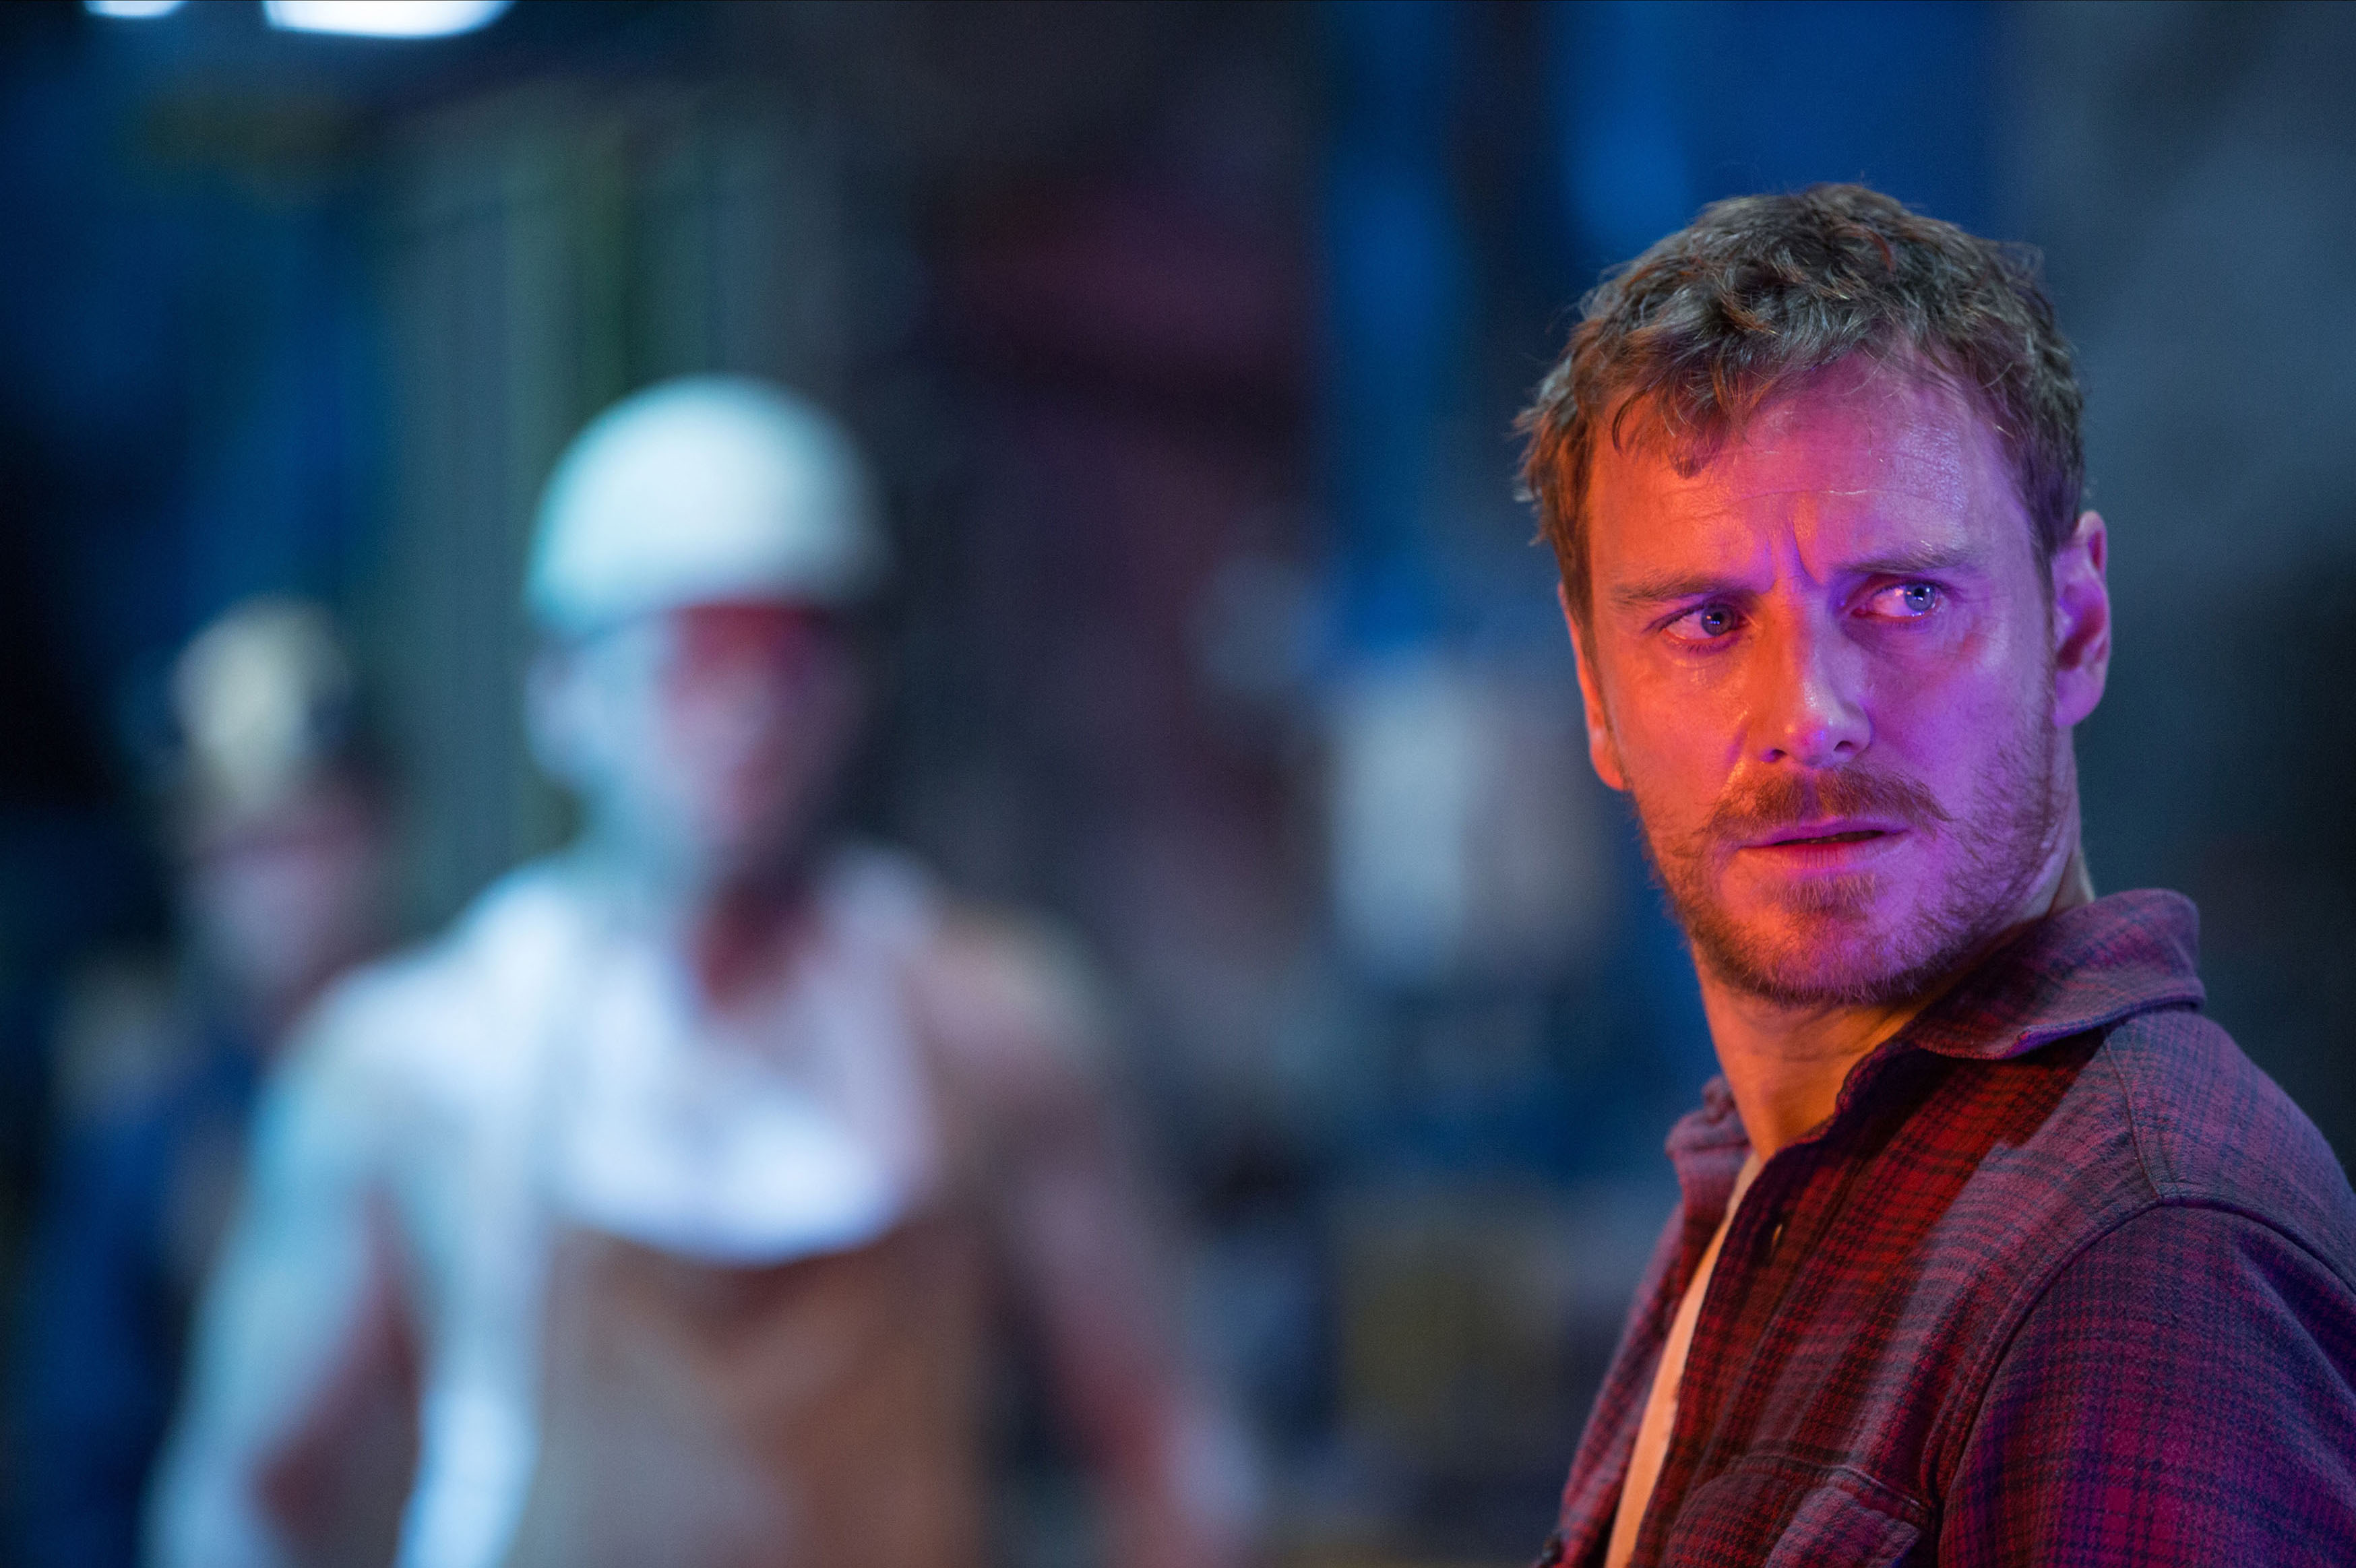 DF-02179 Michael Fassbender as Erik Lensherr / Magneto in X-MEN: APOCALYPSE.